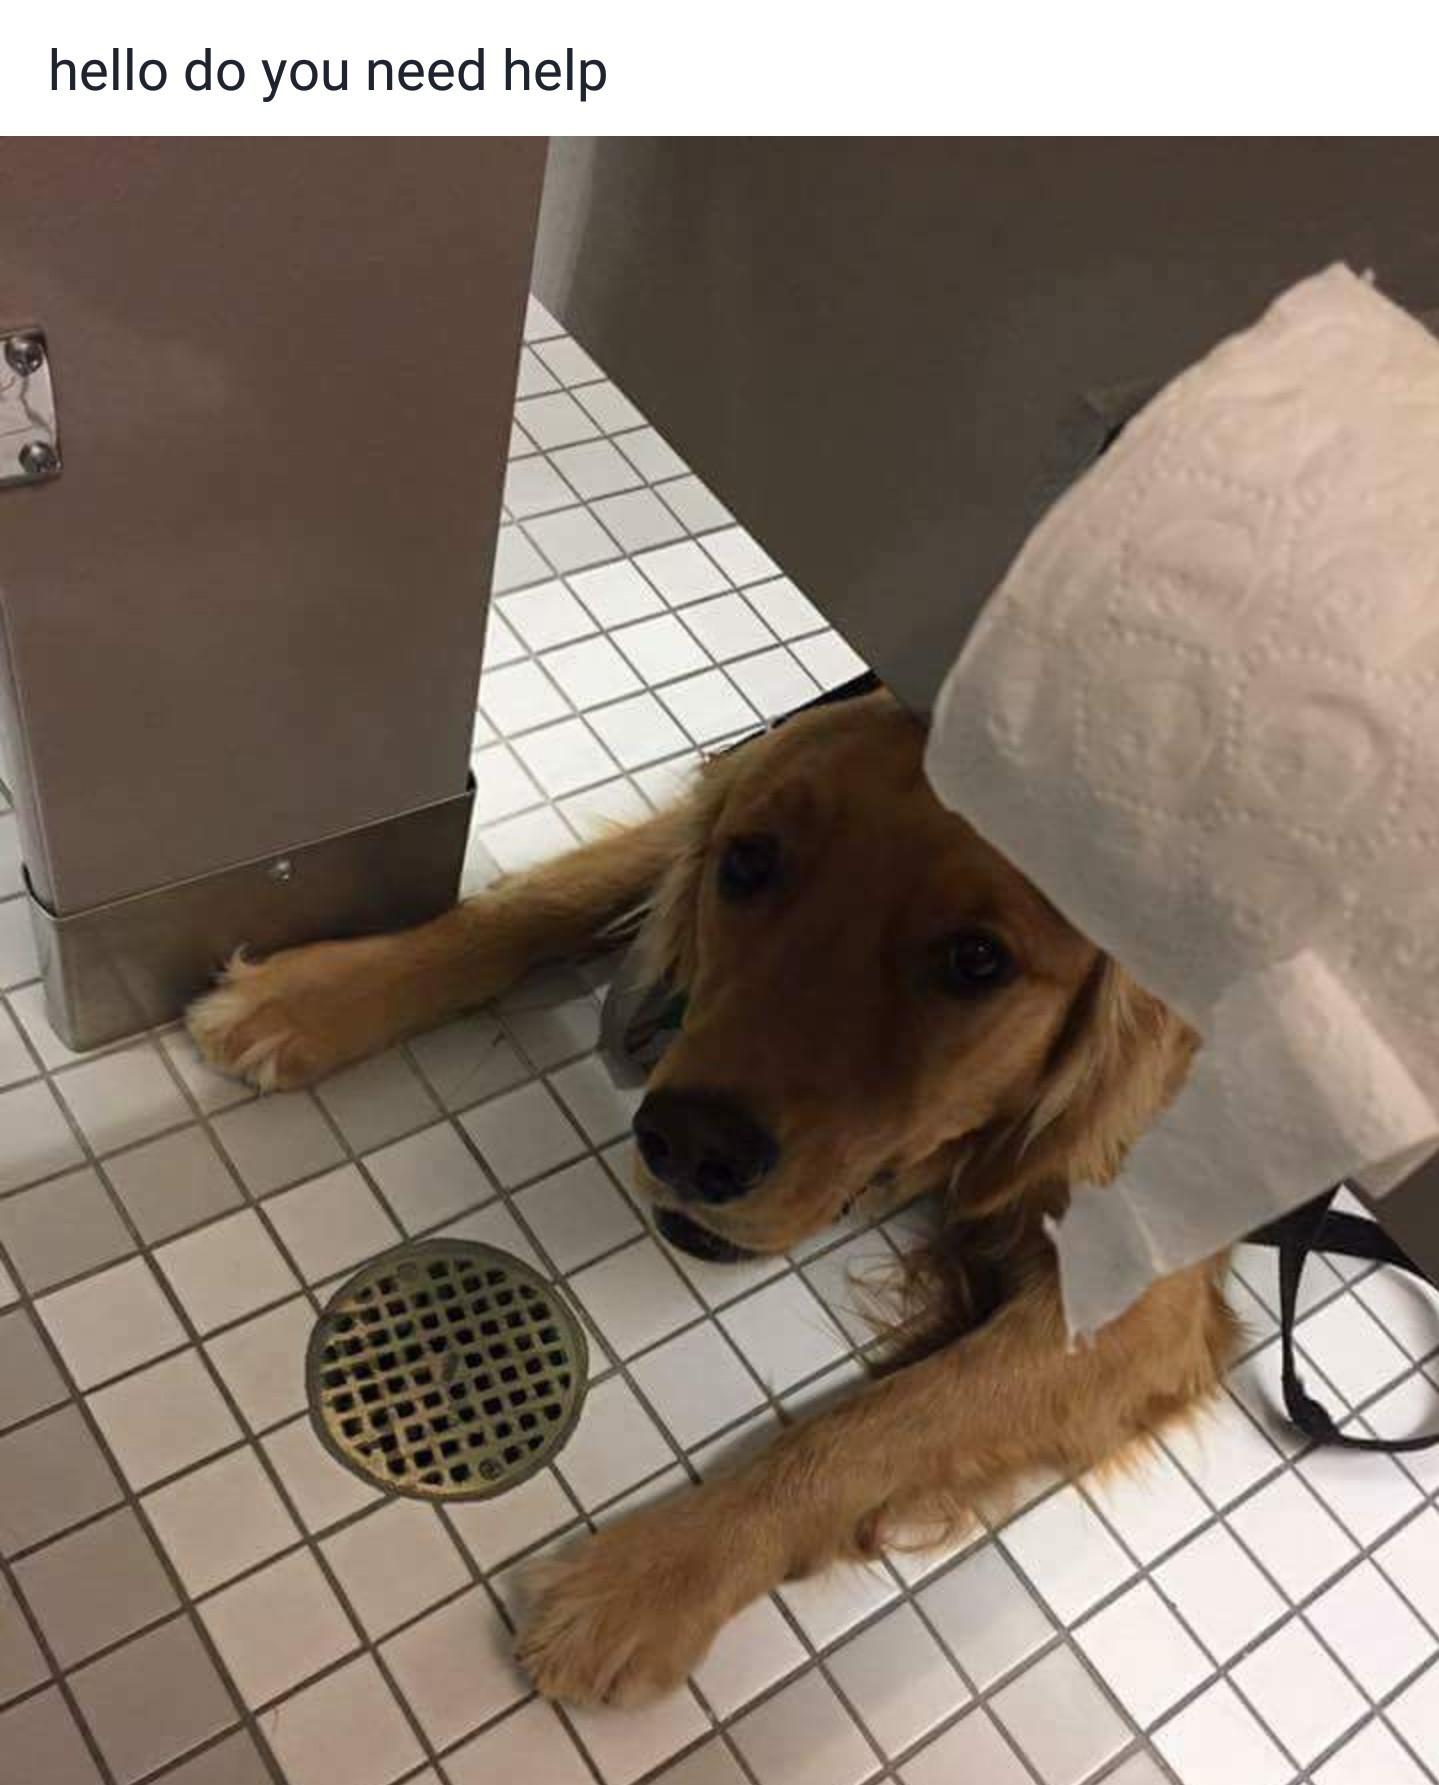 Doggo will help you poop - meme